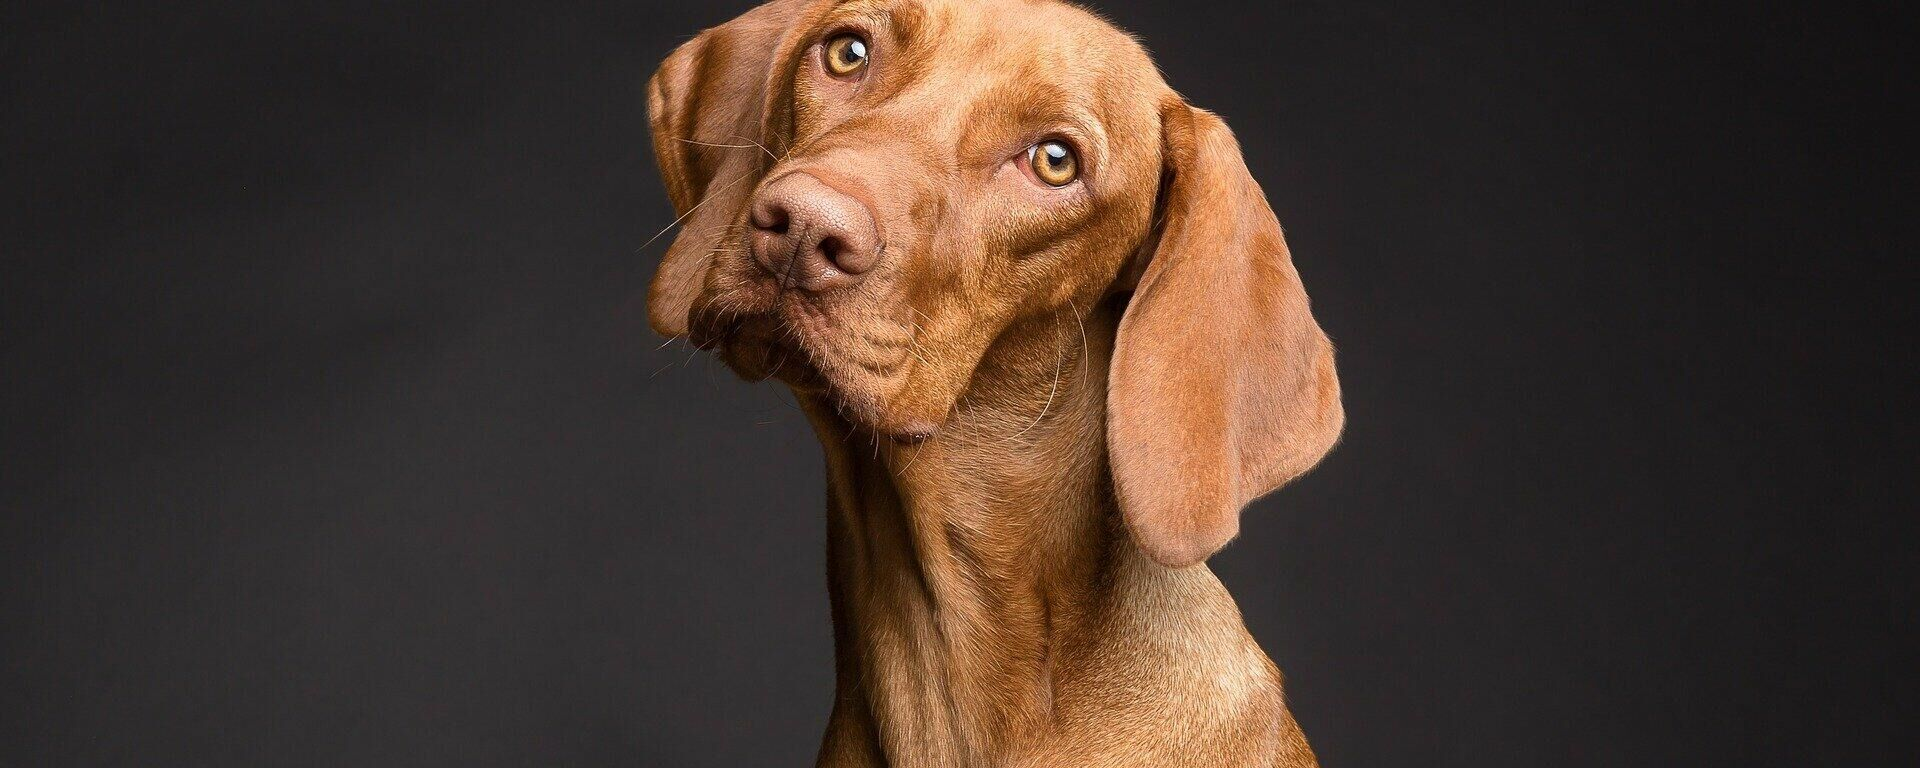 Un perro  - Sputnik Mundo, 1920, 05.08.2021